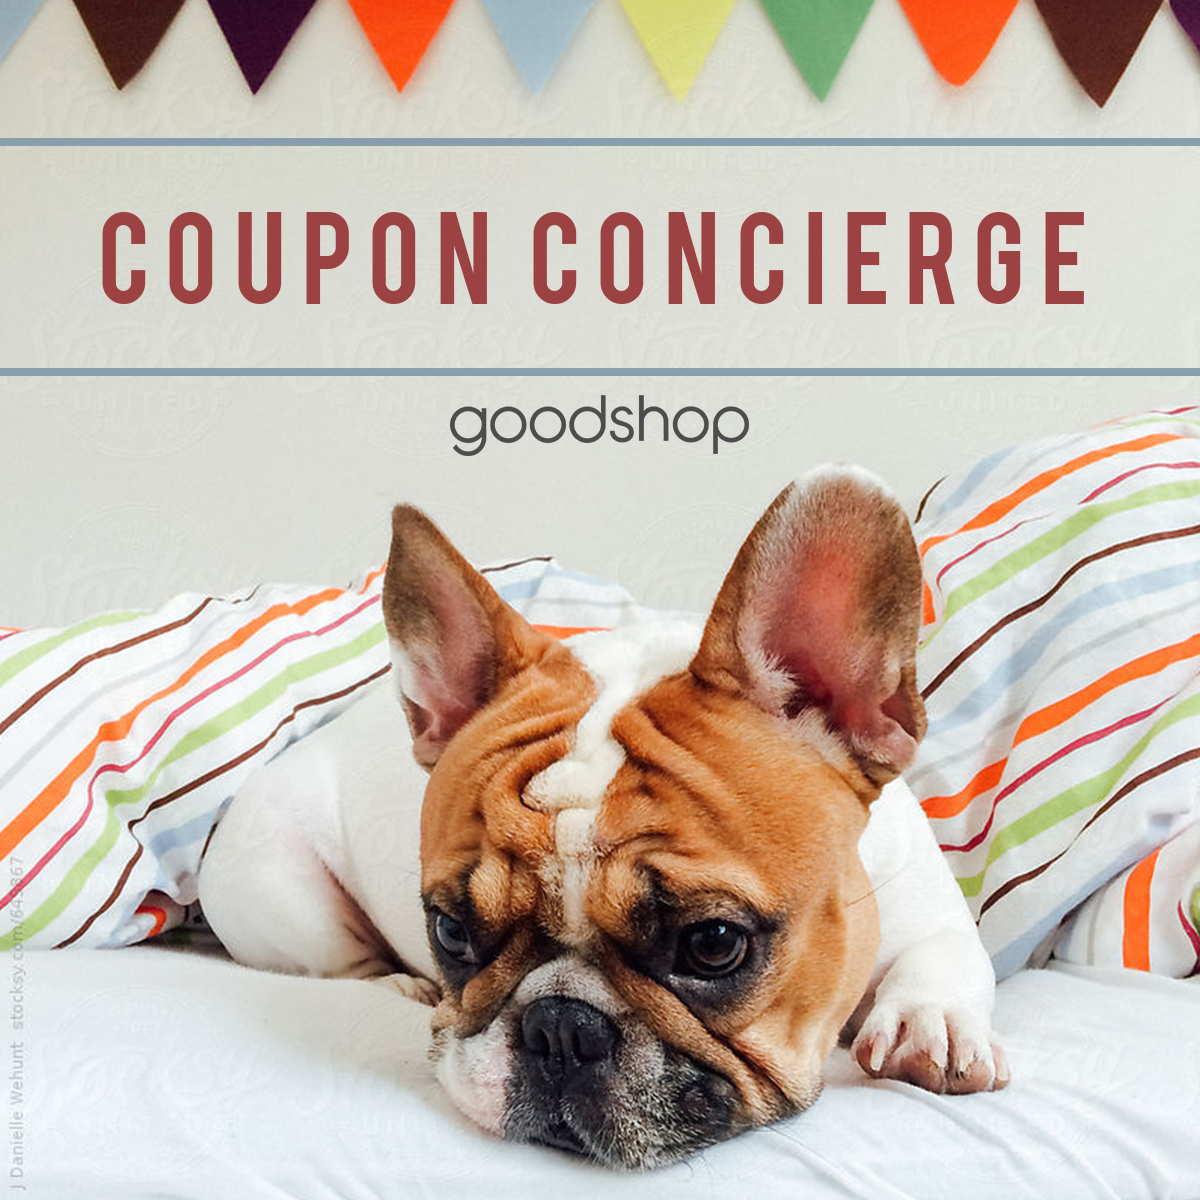 concierge-facebook-1200x1200-06.png